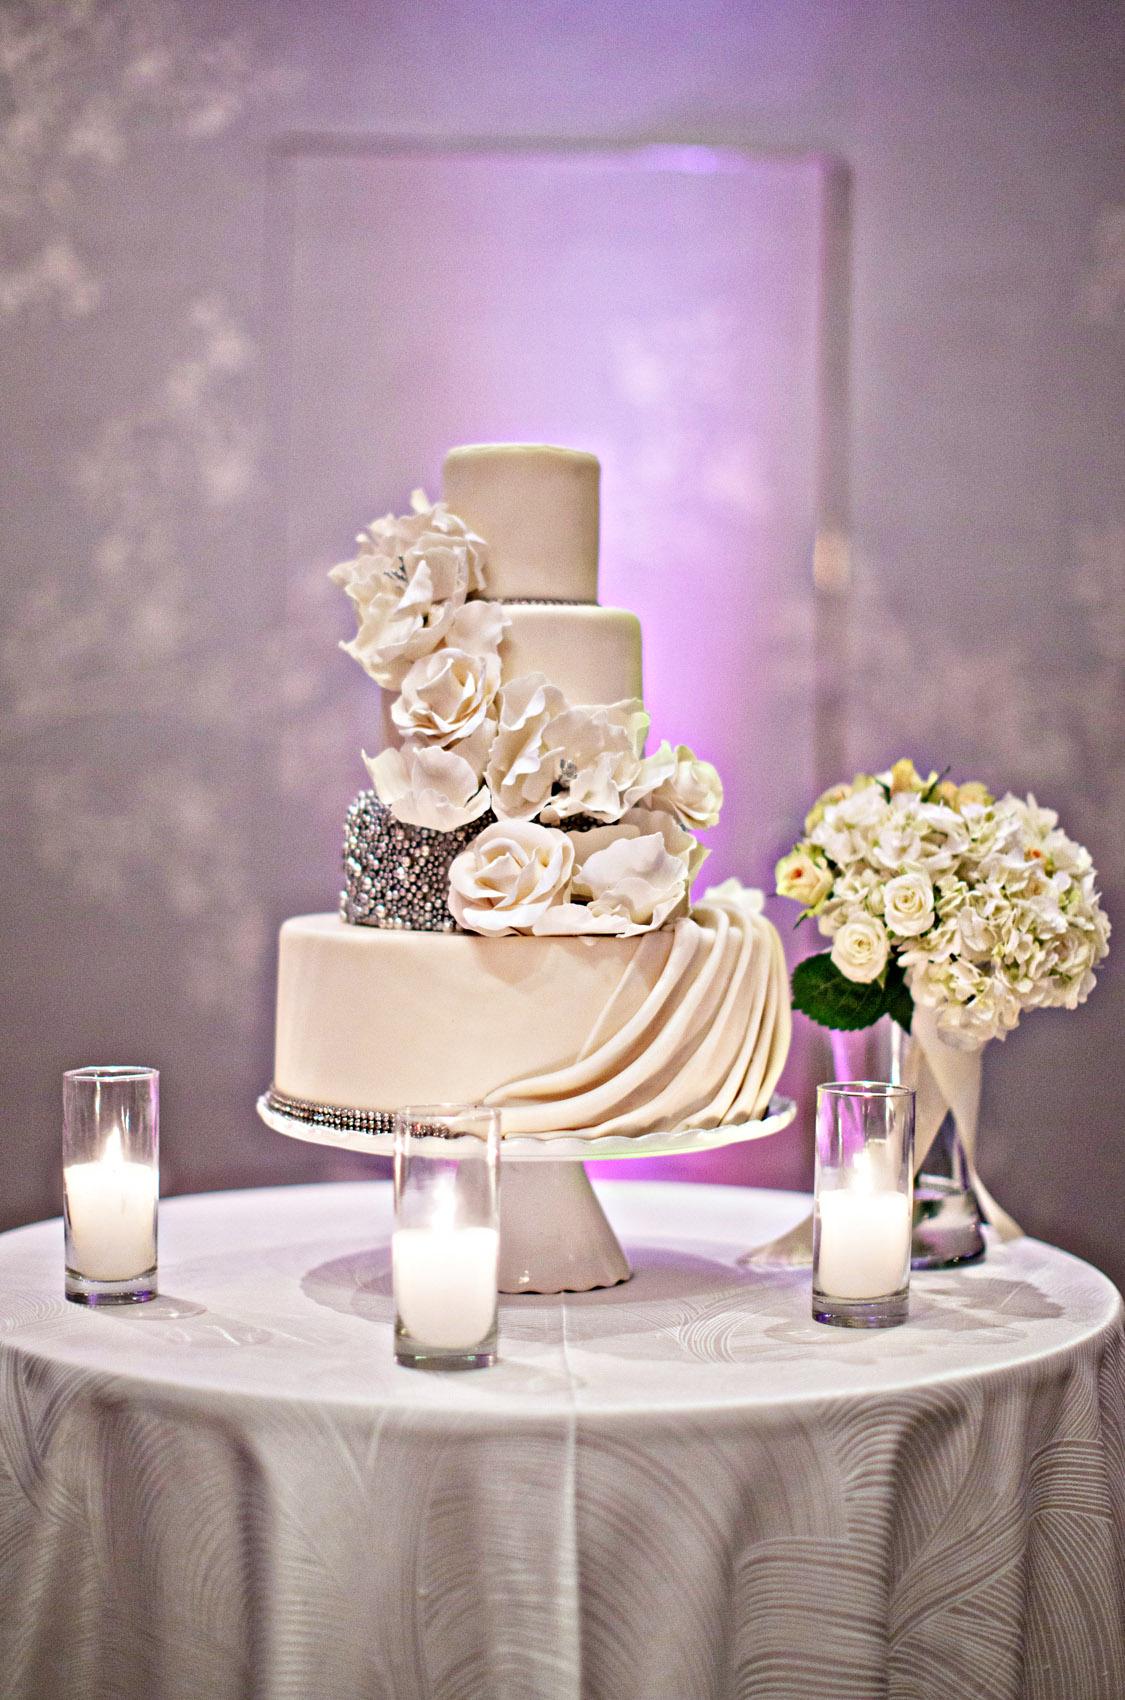 073Hotel Bel Air Wedding Joy Marie.jpg